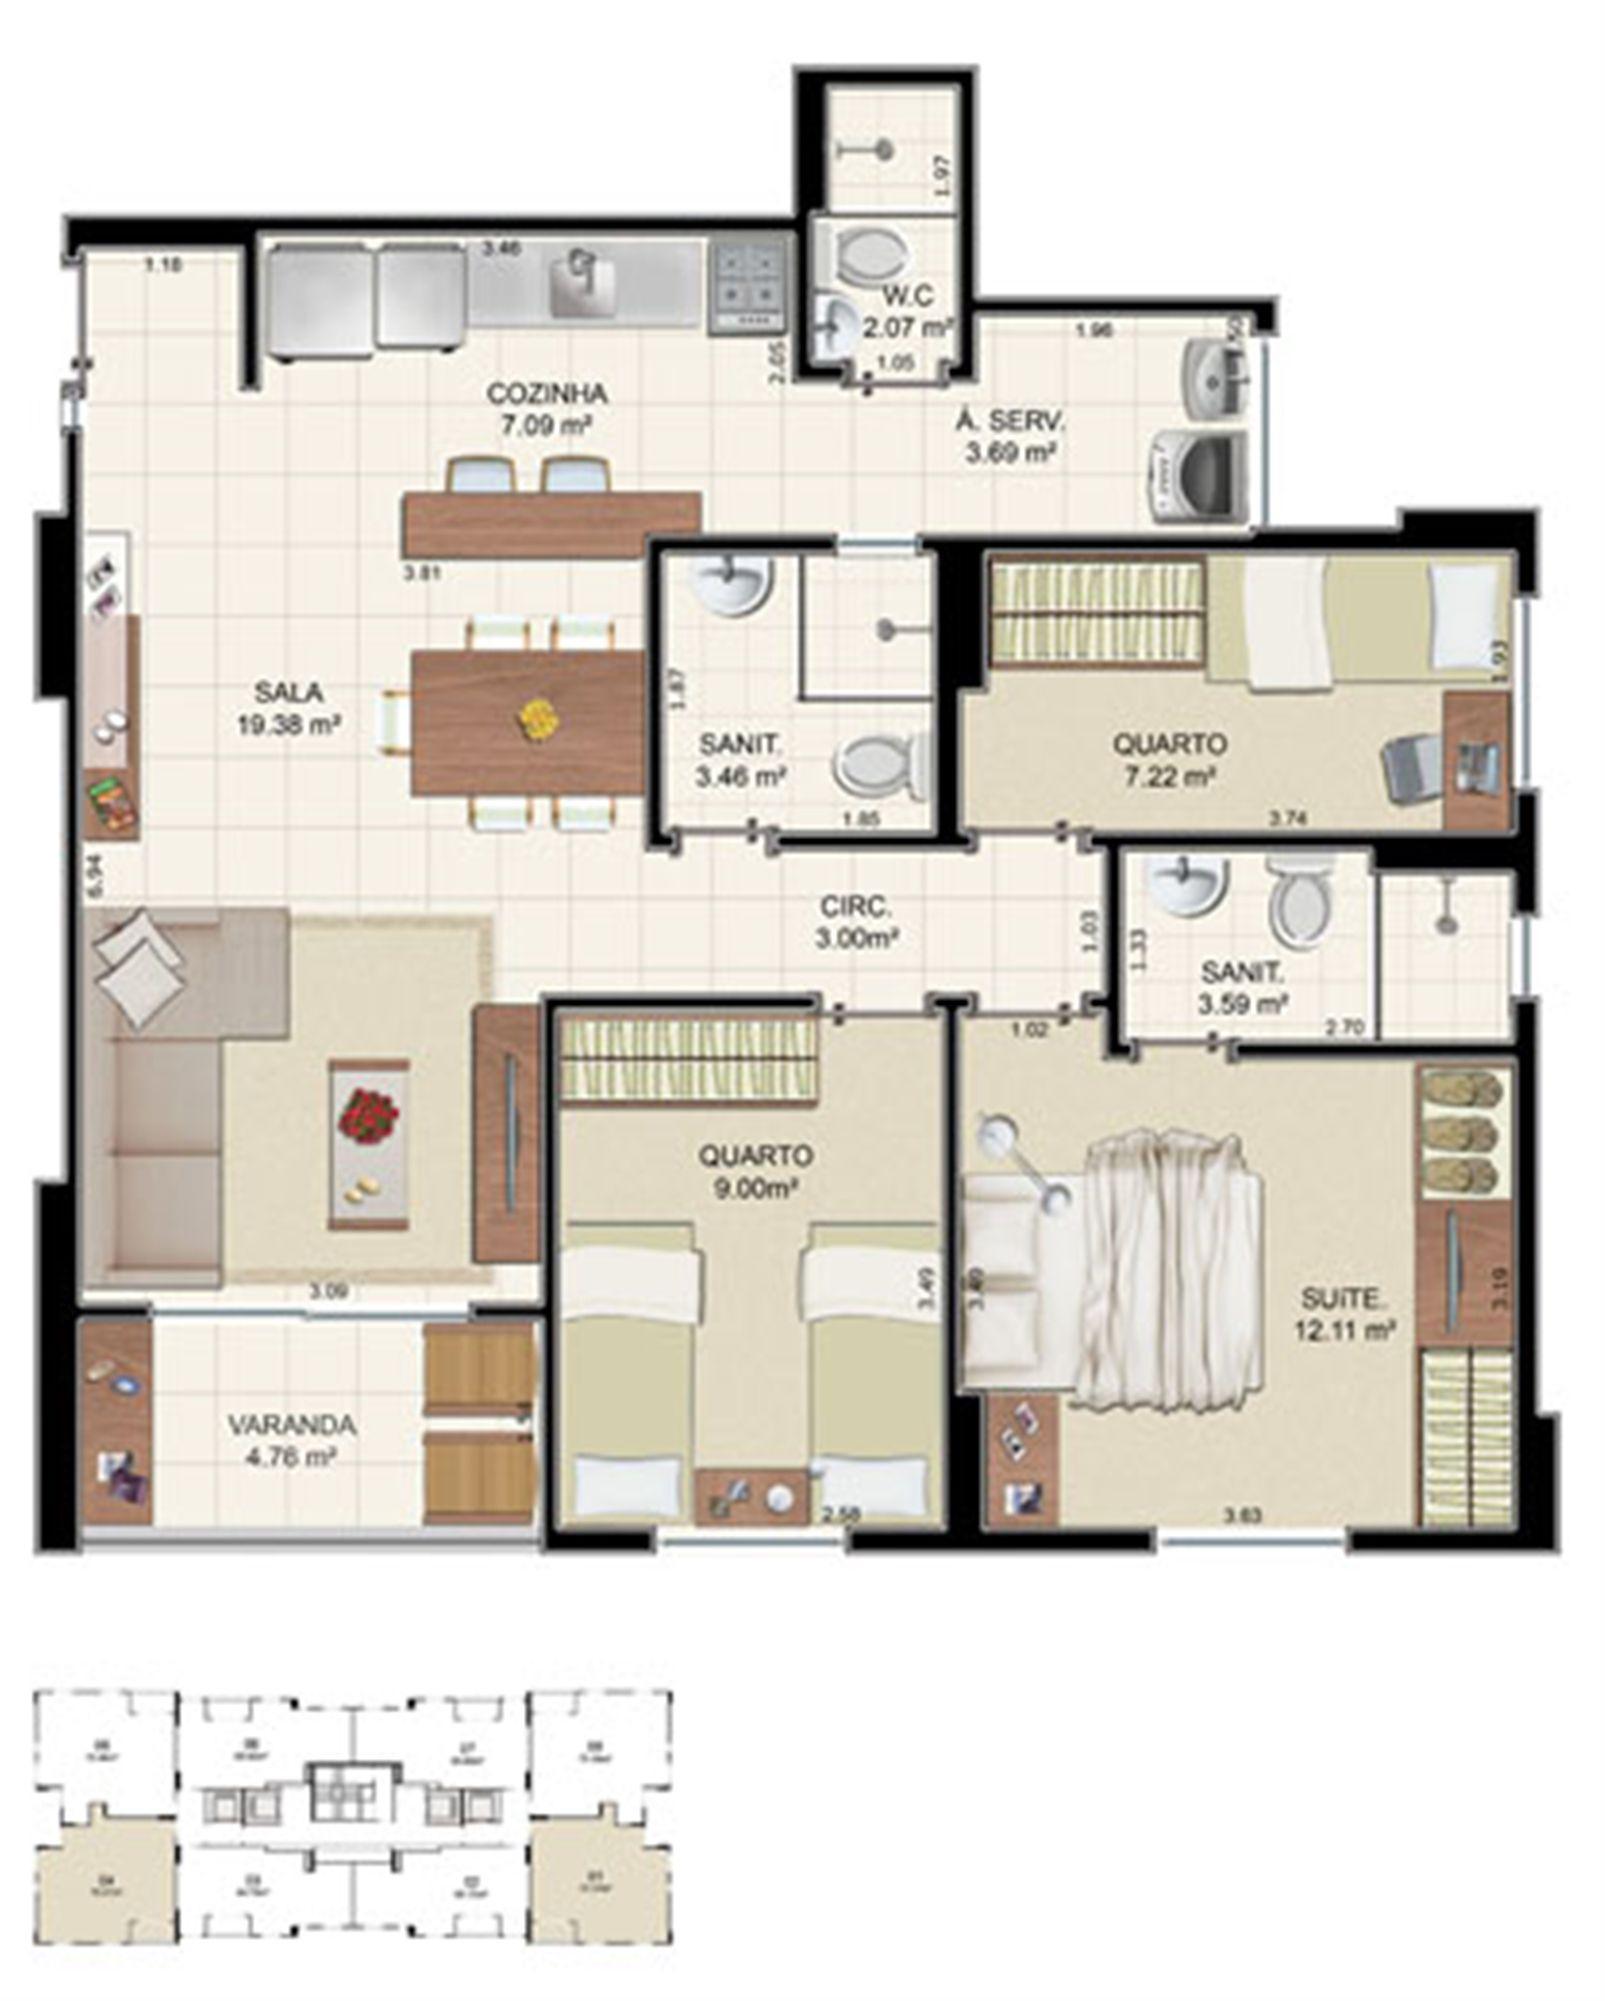 Planta Tipo 3 quartos - 75,37 m²   Morada Alto do Imbuí – Apartamentono  Alto do Imbuí - Salvador - Bahia